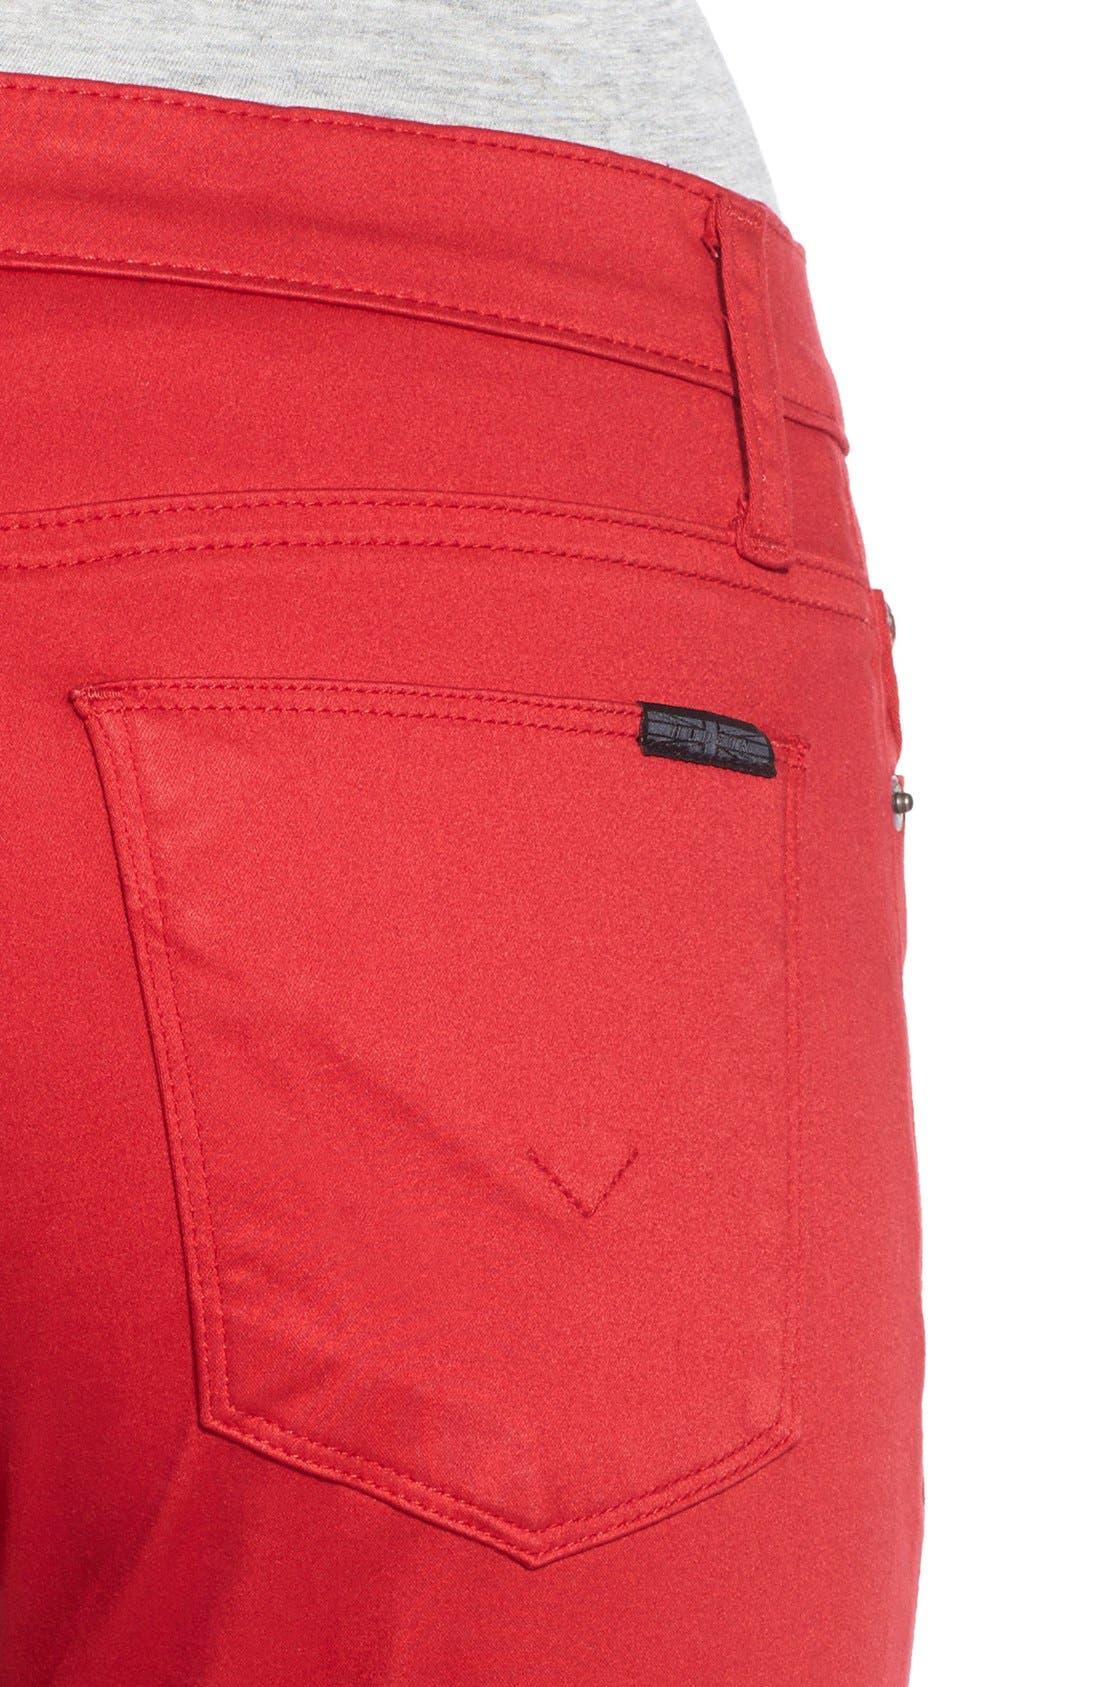 'Nico' Skinny Jeans,                             Alternate thumbnail 2, color,                             610